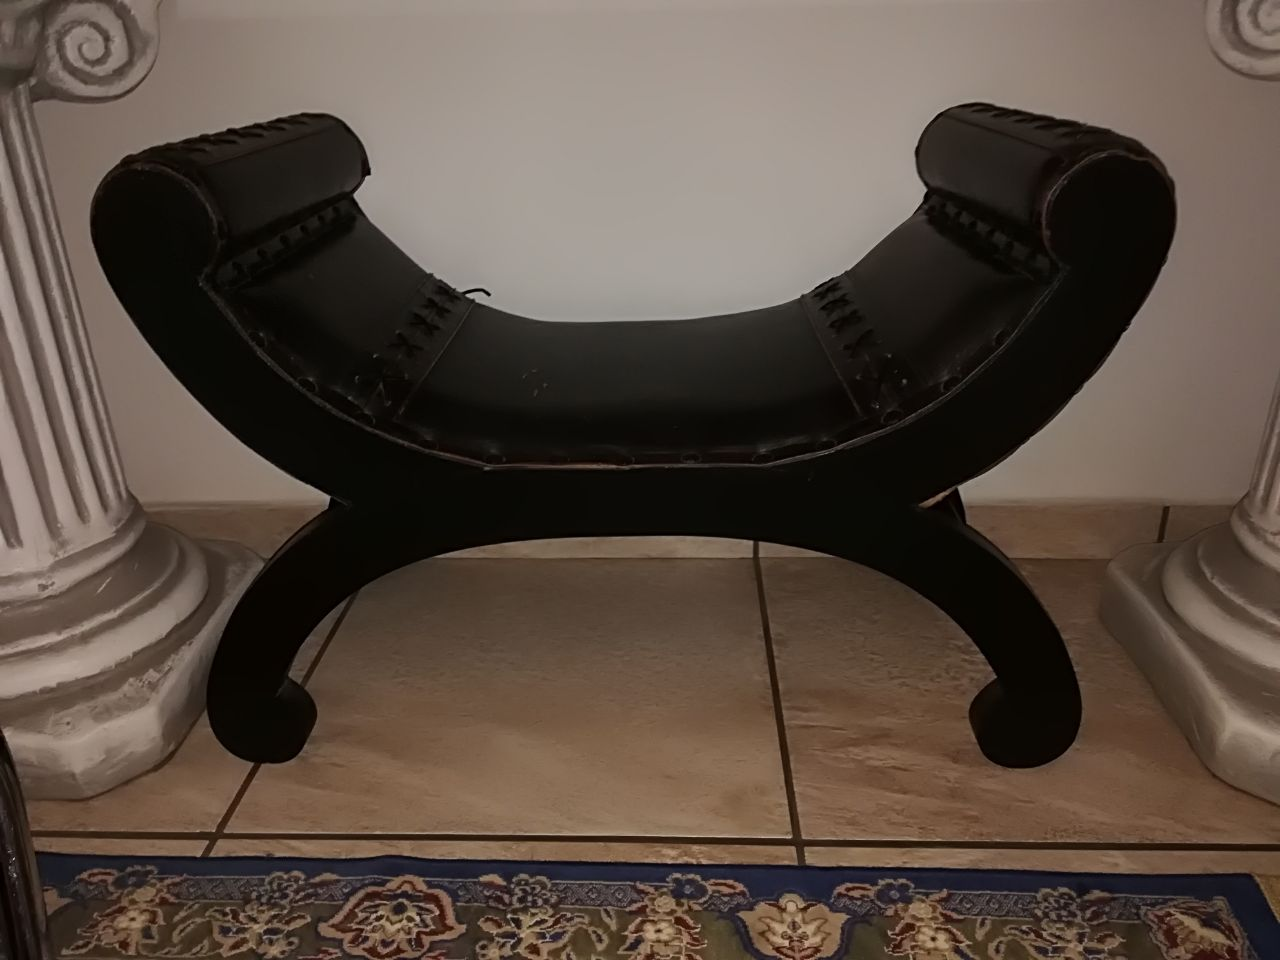 Leather Arabian saddle chair